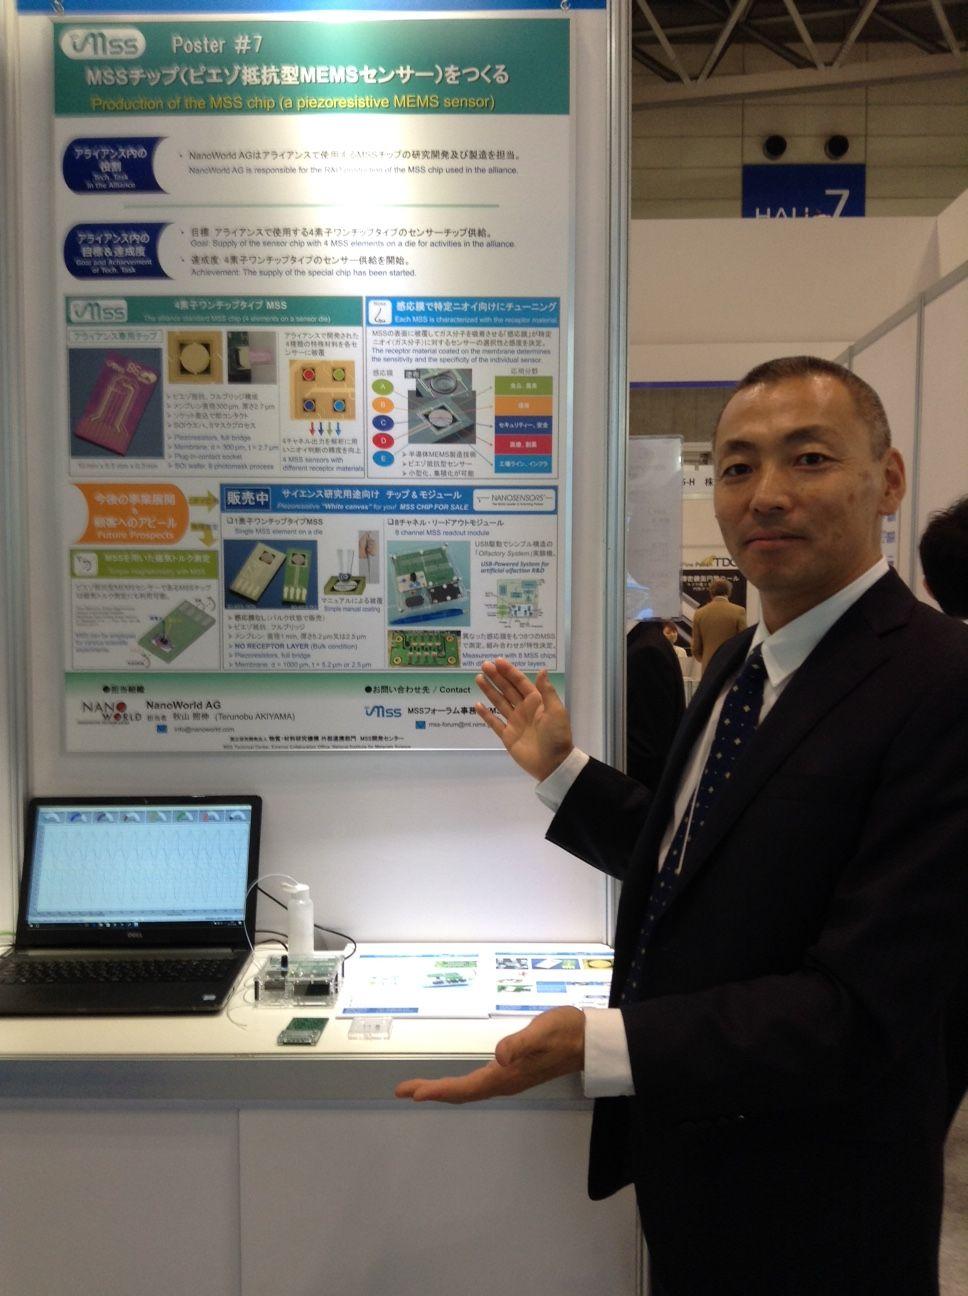 Dr Terunobu Akiyama presenting the NANOSENSORS Membrane Type Surface Stress Sensors (MSS) at MEMS SENSING & NETWORK SYSTEM 2017